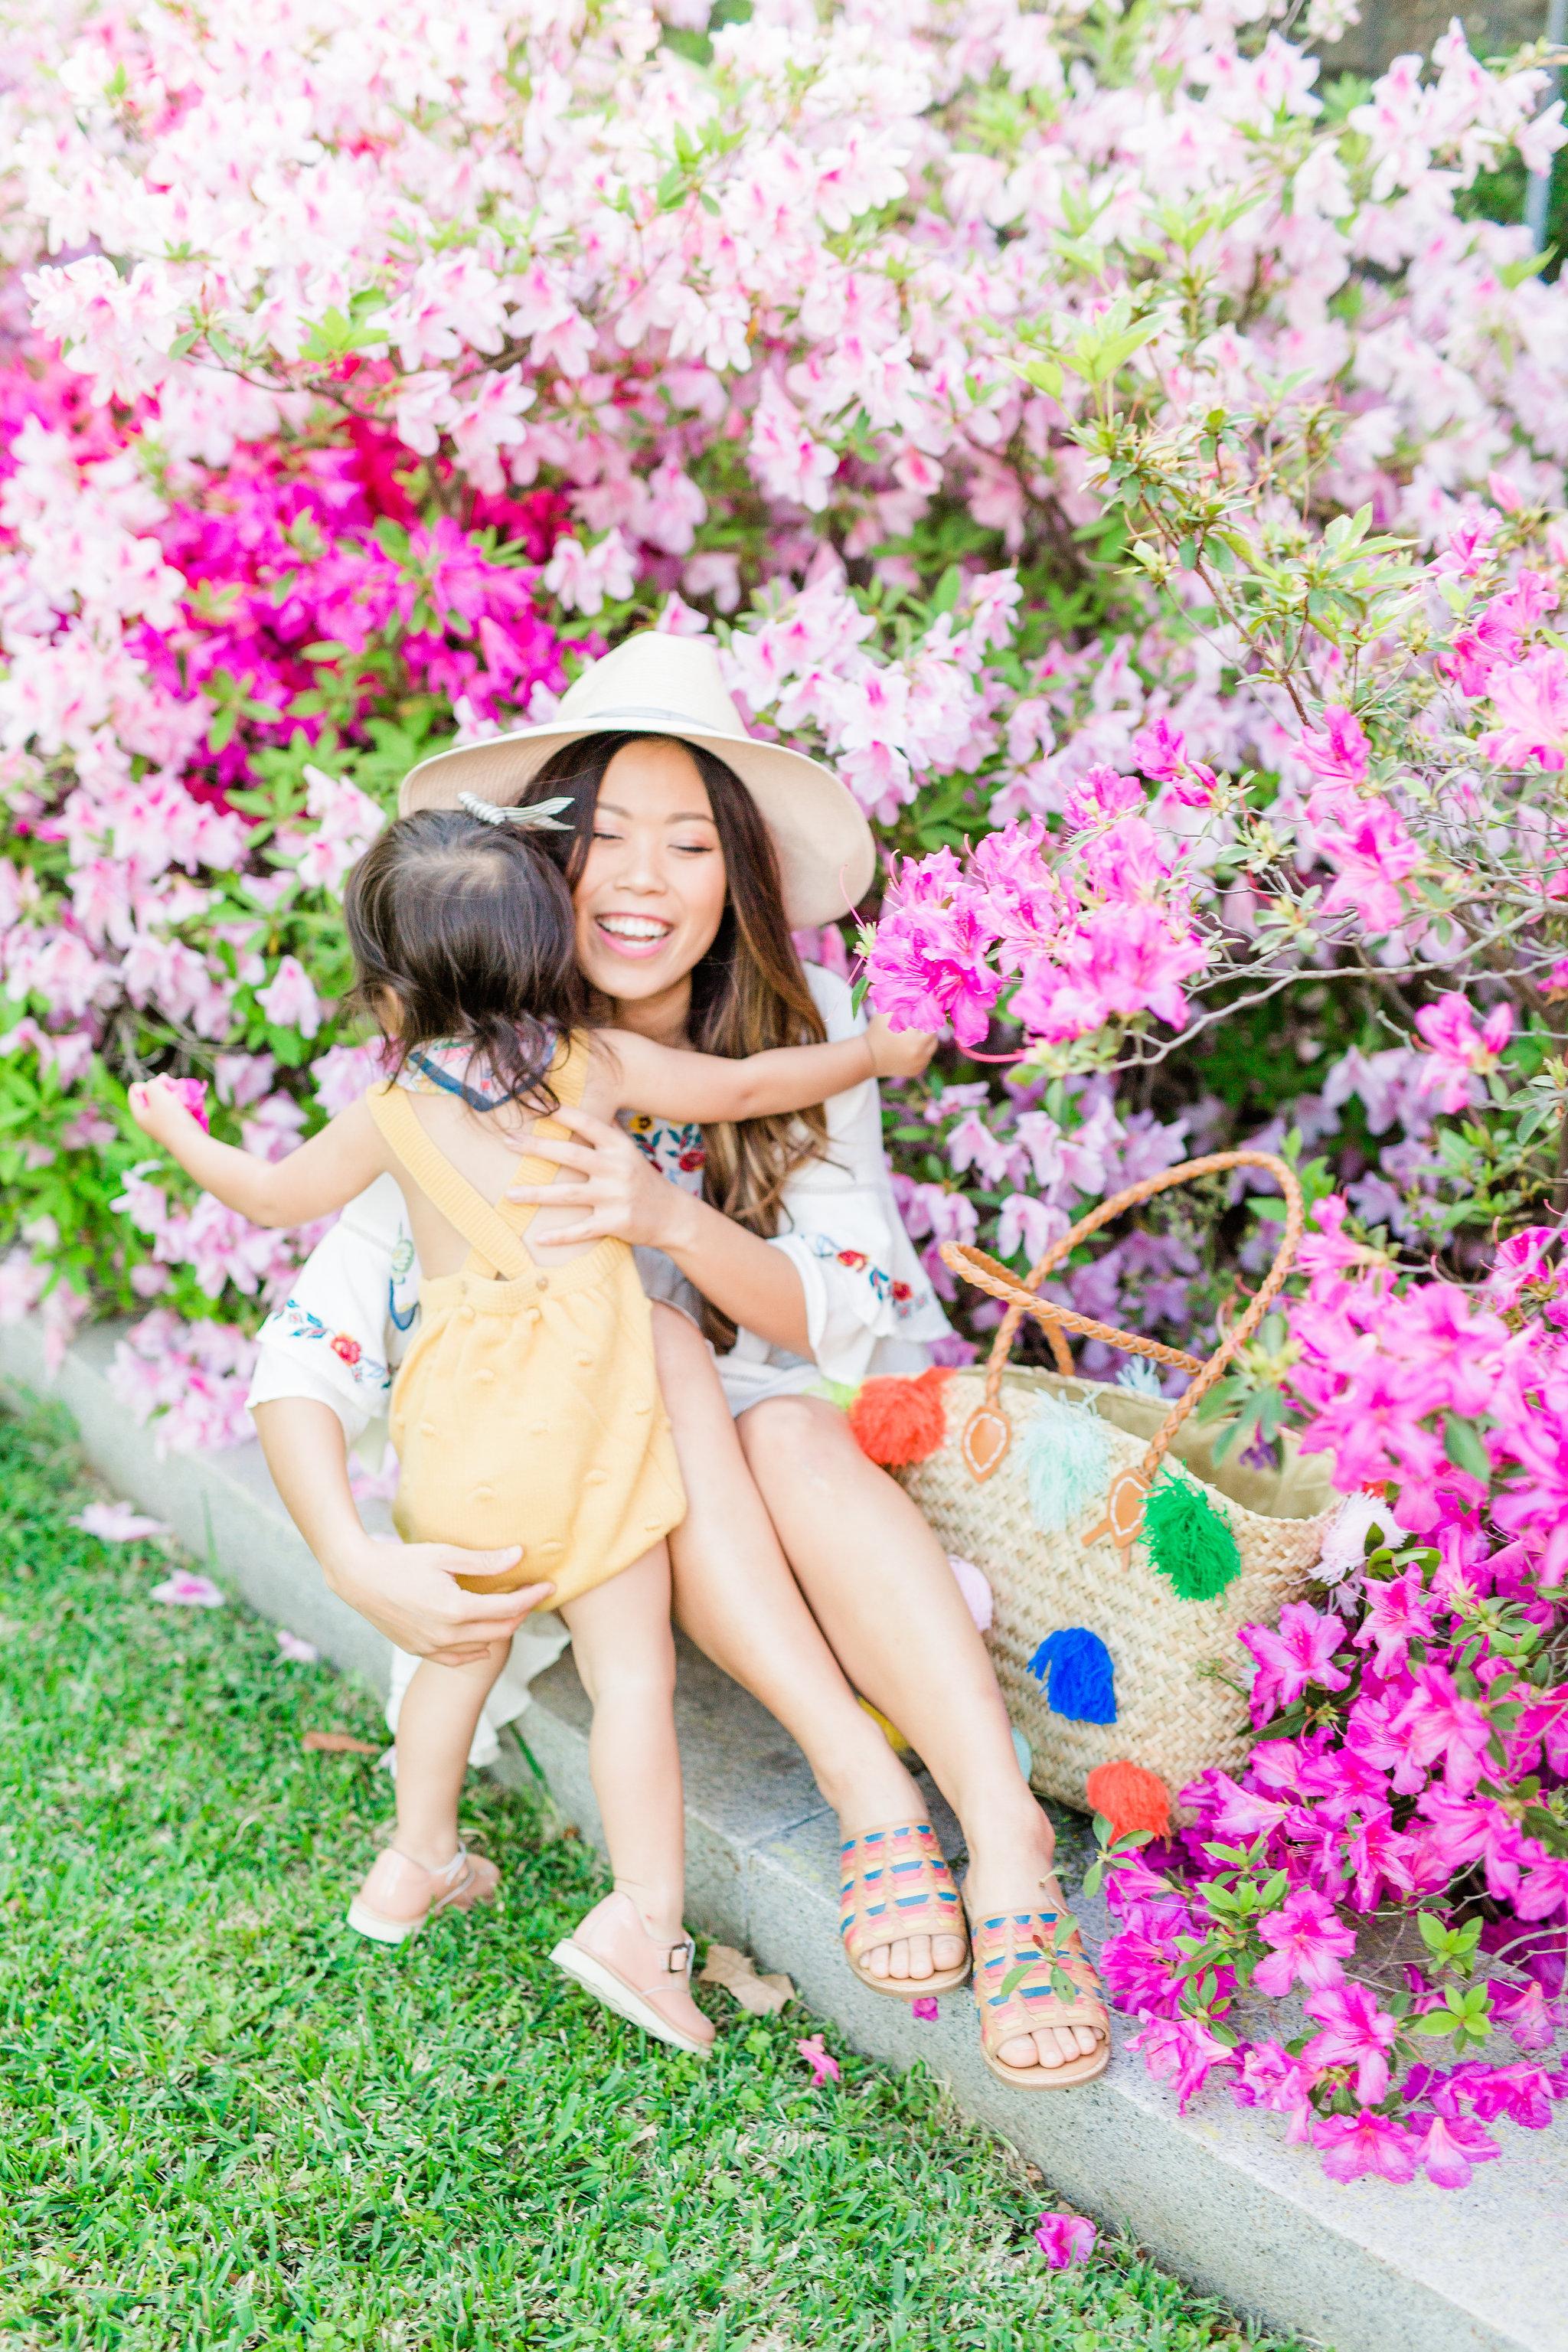 Joyfullygreen Comfortiva Brileigh Houston Azalea Trail Photoshoot. Pom Pom bag rainbow sandals mommy and me.jpg